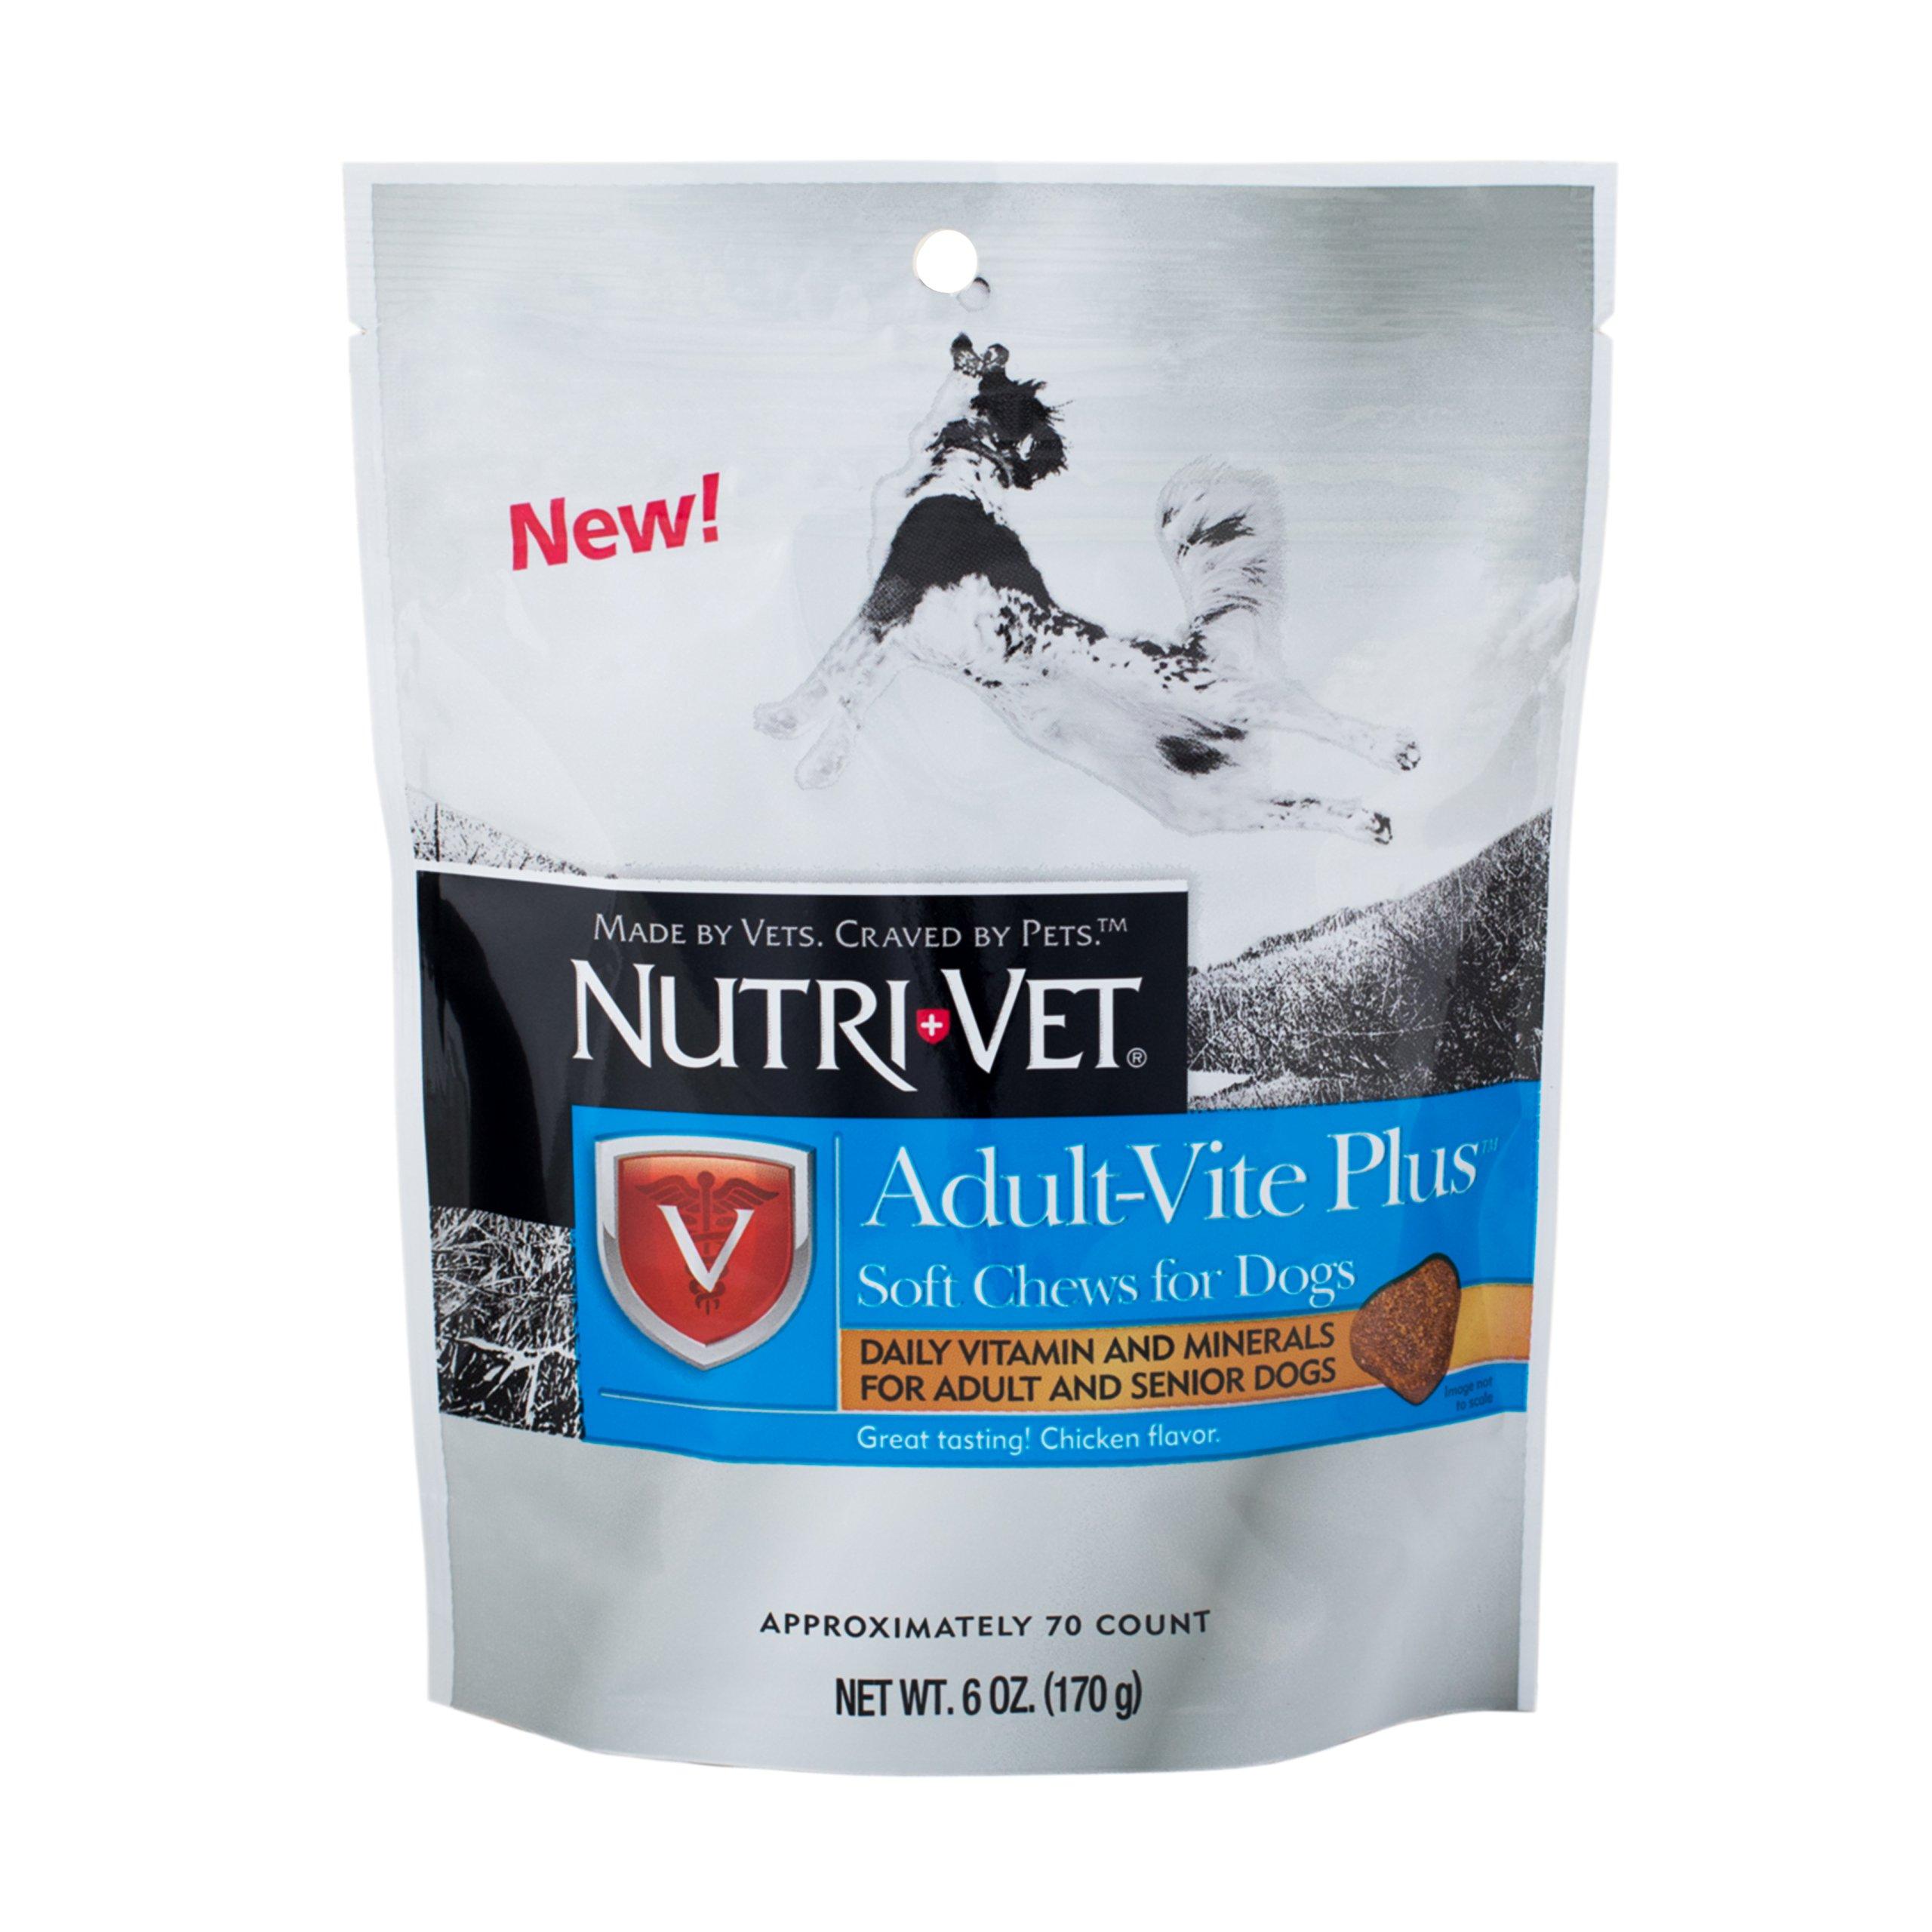 Nutri-Vet Adult-Vite Plus Soft Chews